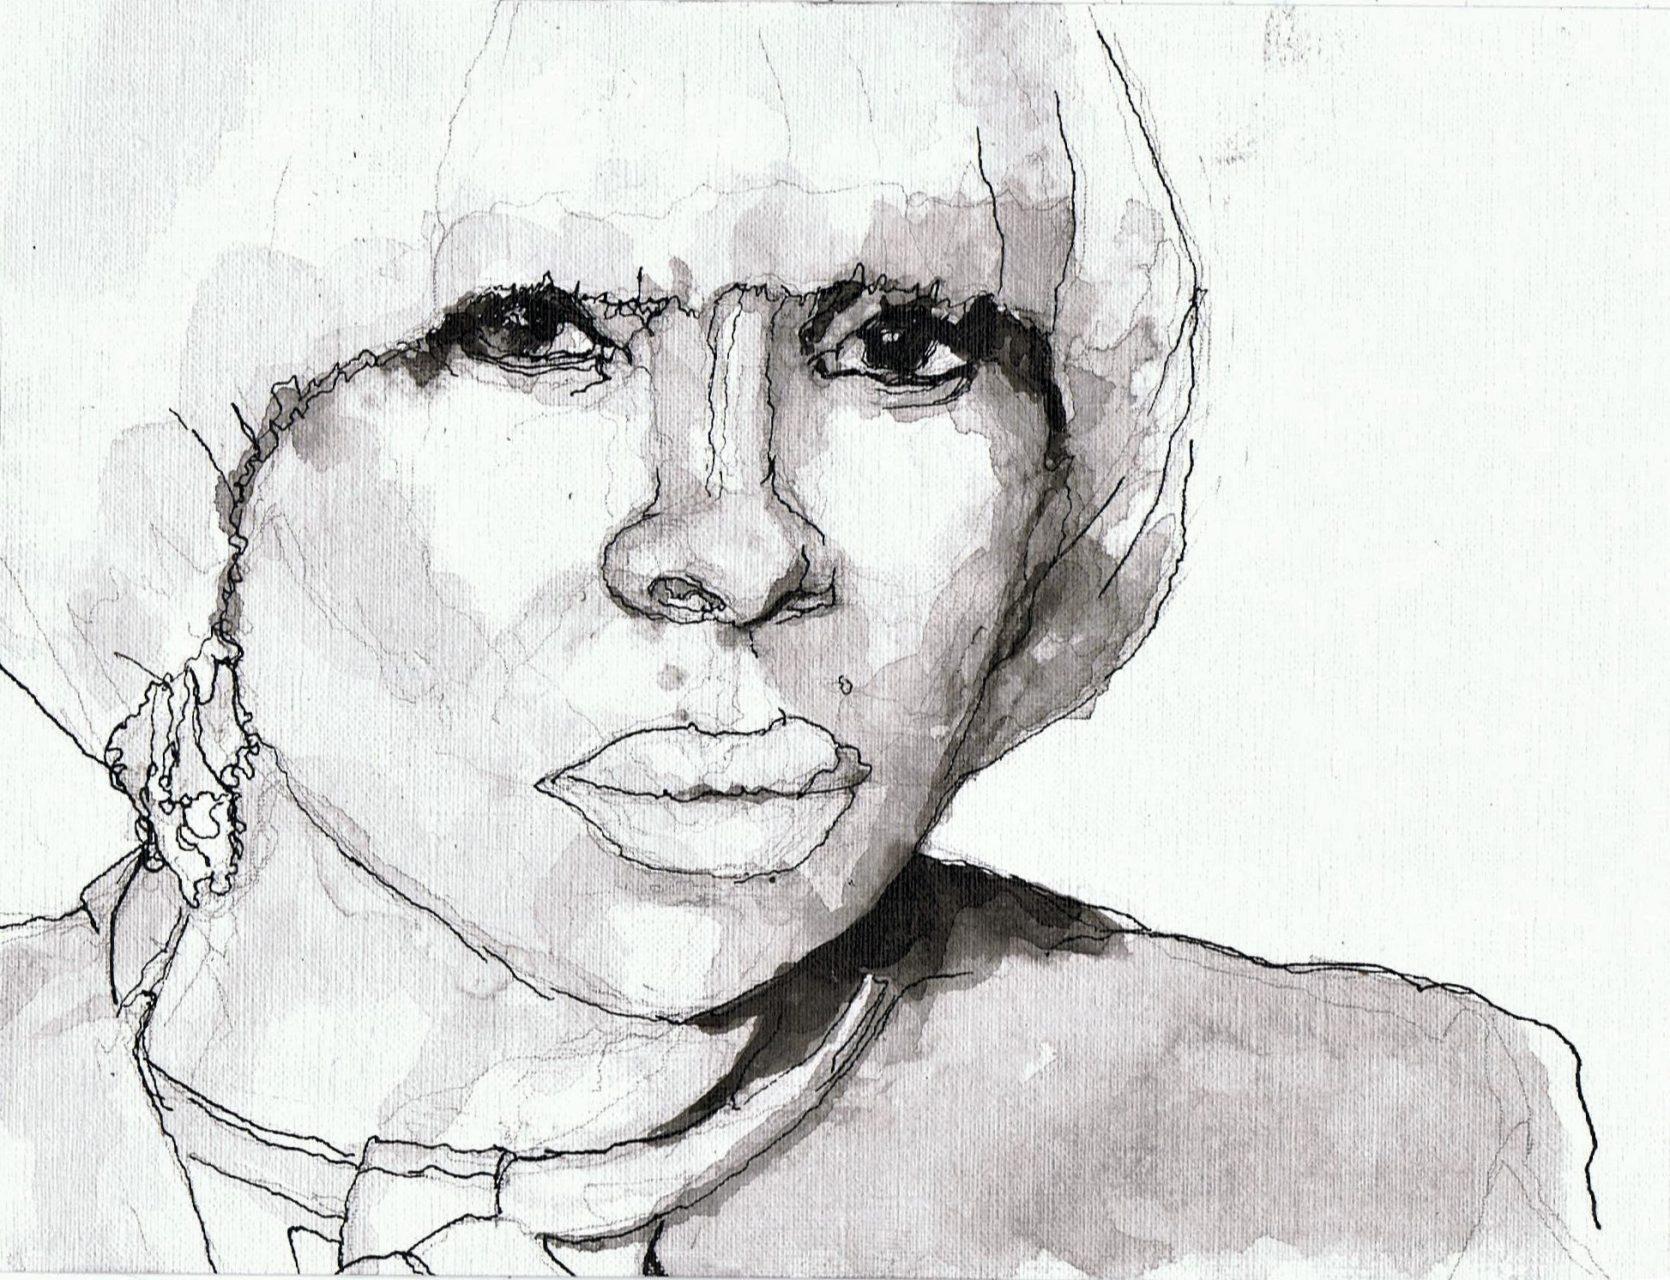 365 dagen een portret Mary J. Blige, singer-songwriter Inkt gewassen 19c25